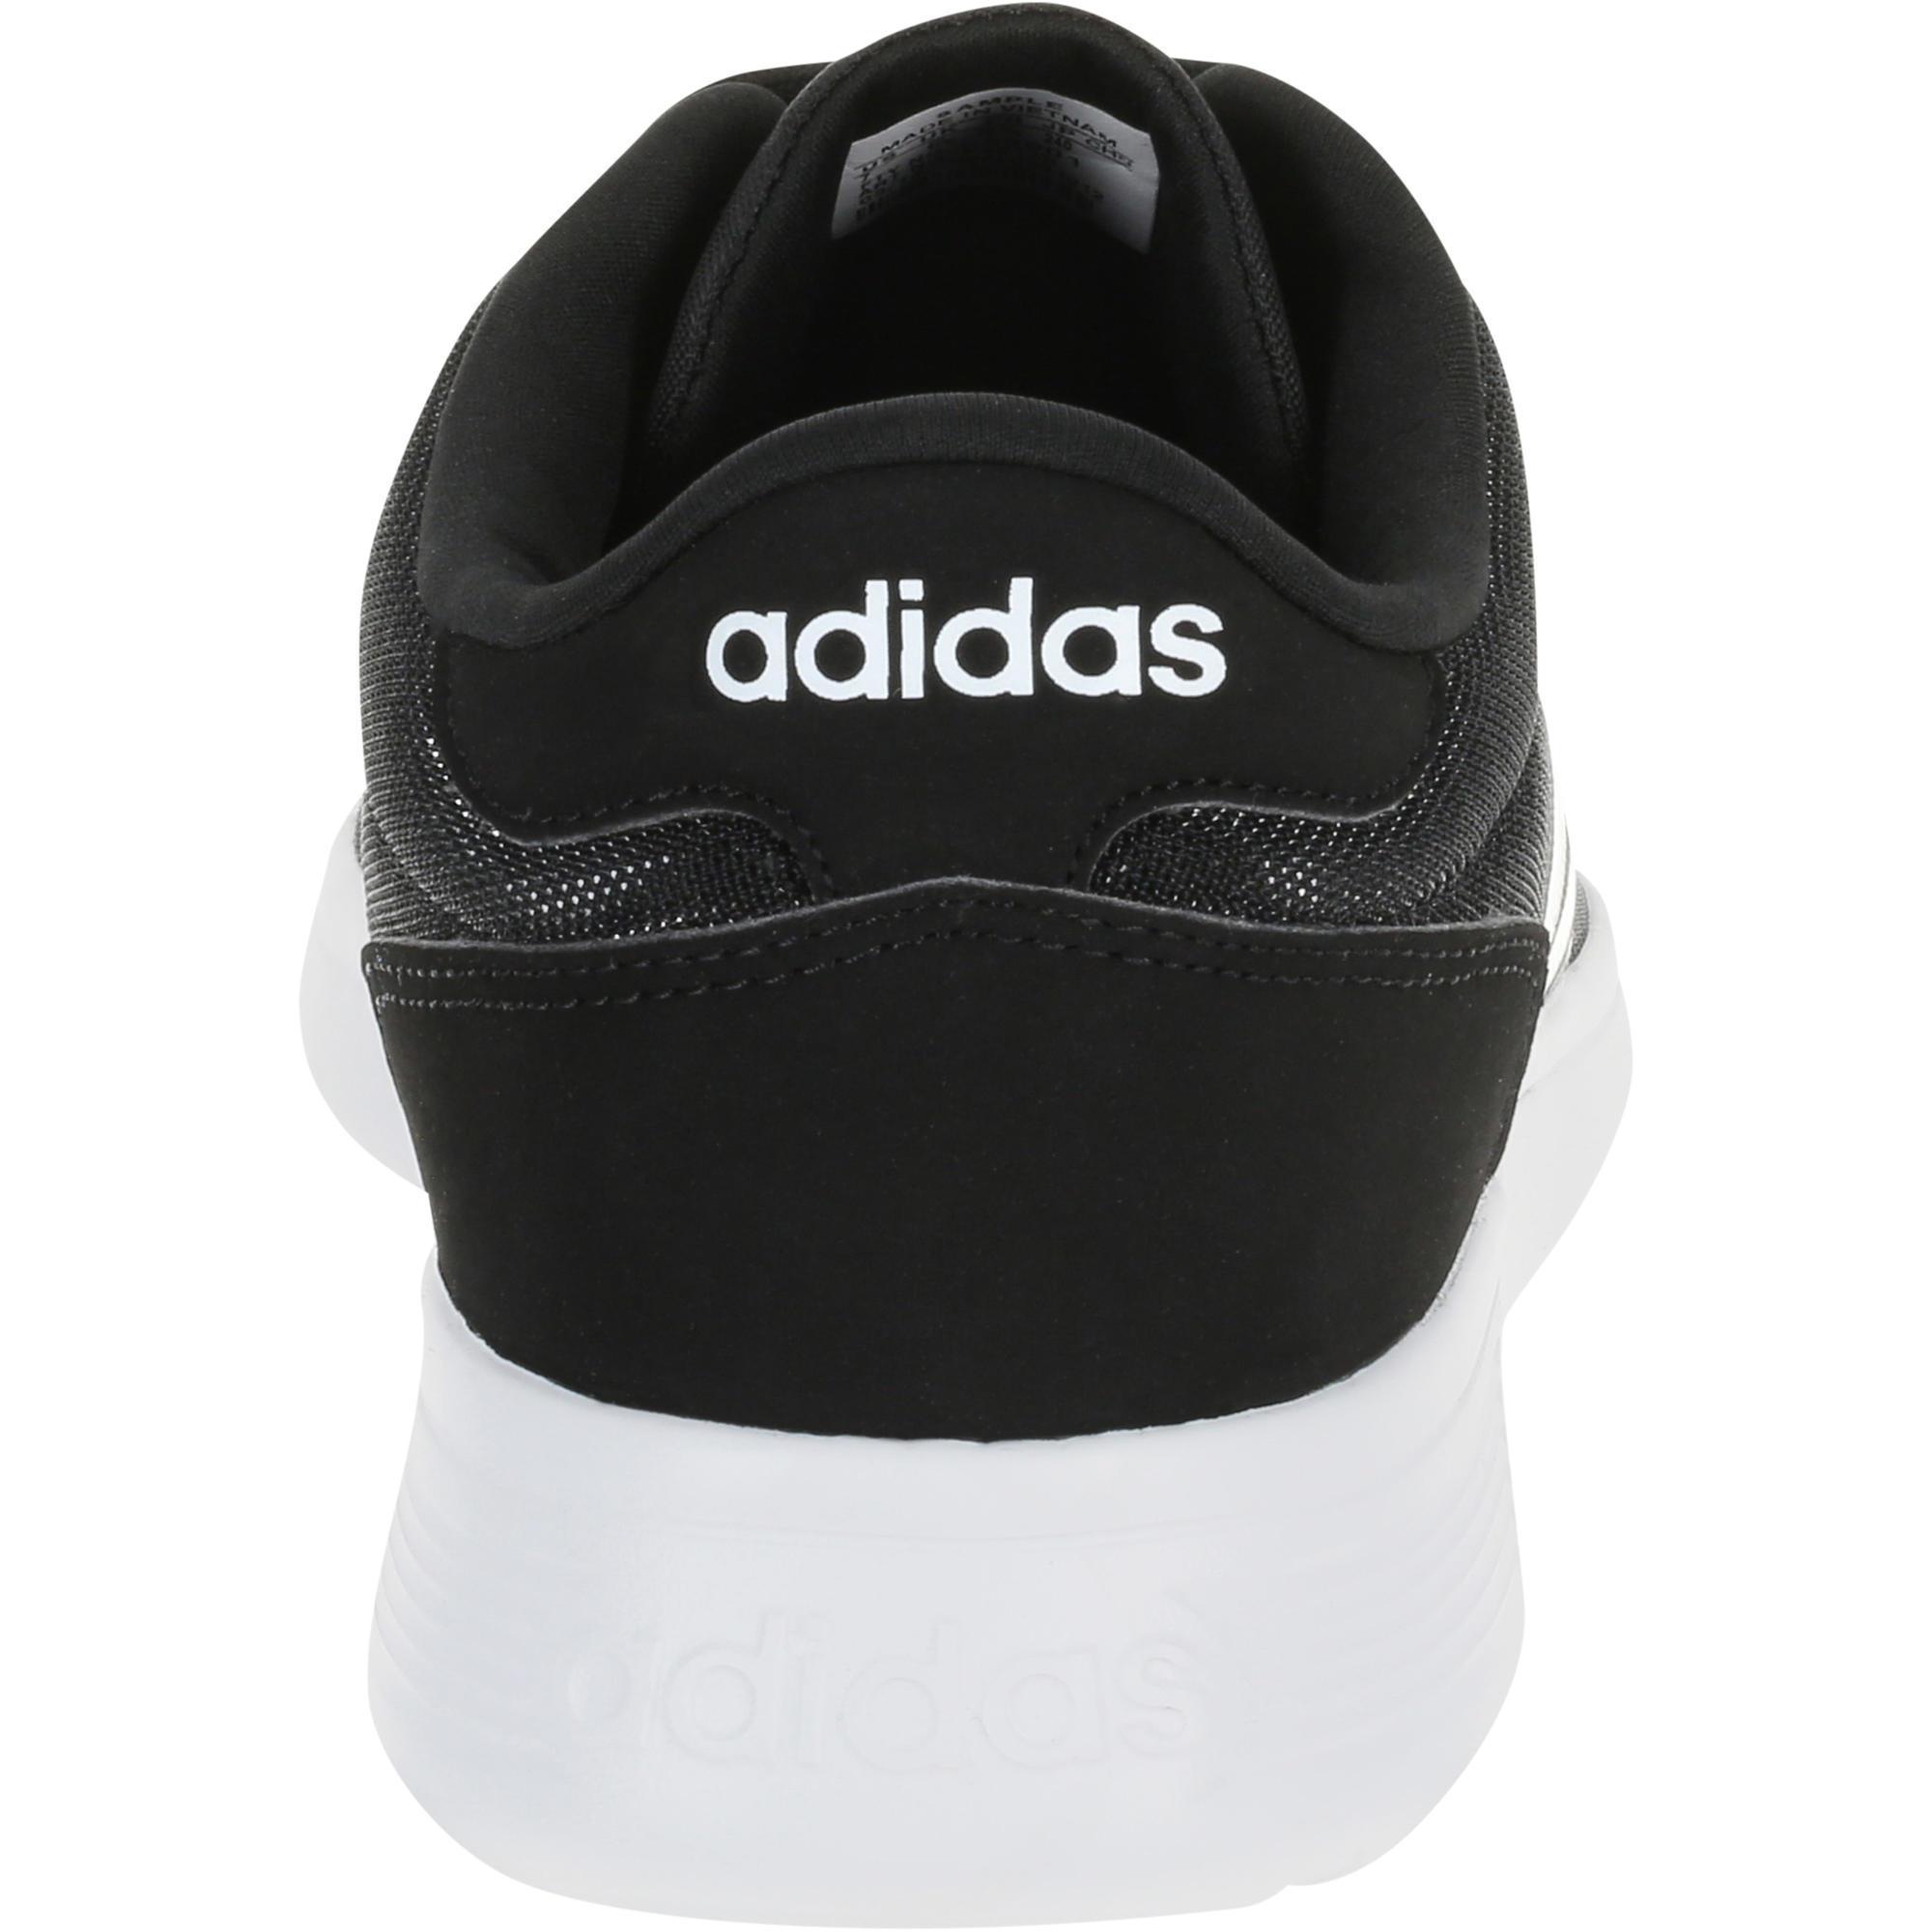 3e98325a4356 Sportive Lite Chaussures Decathlon Marche Noir Femme Adidas Racer wxAE0dq0I